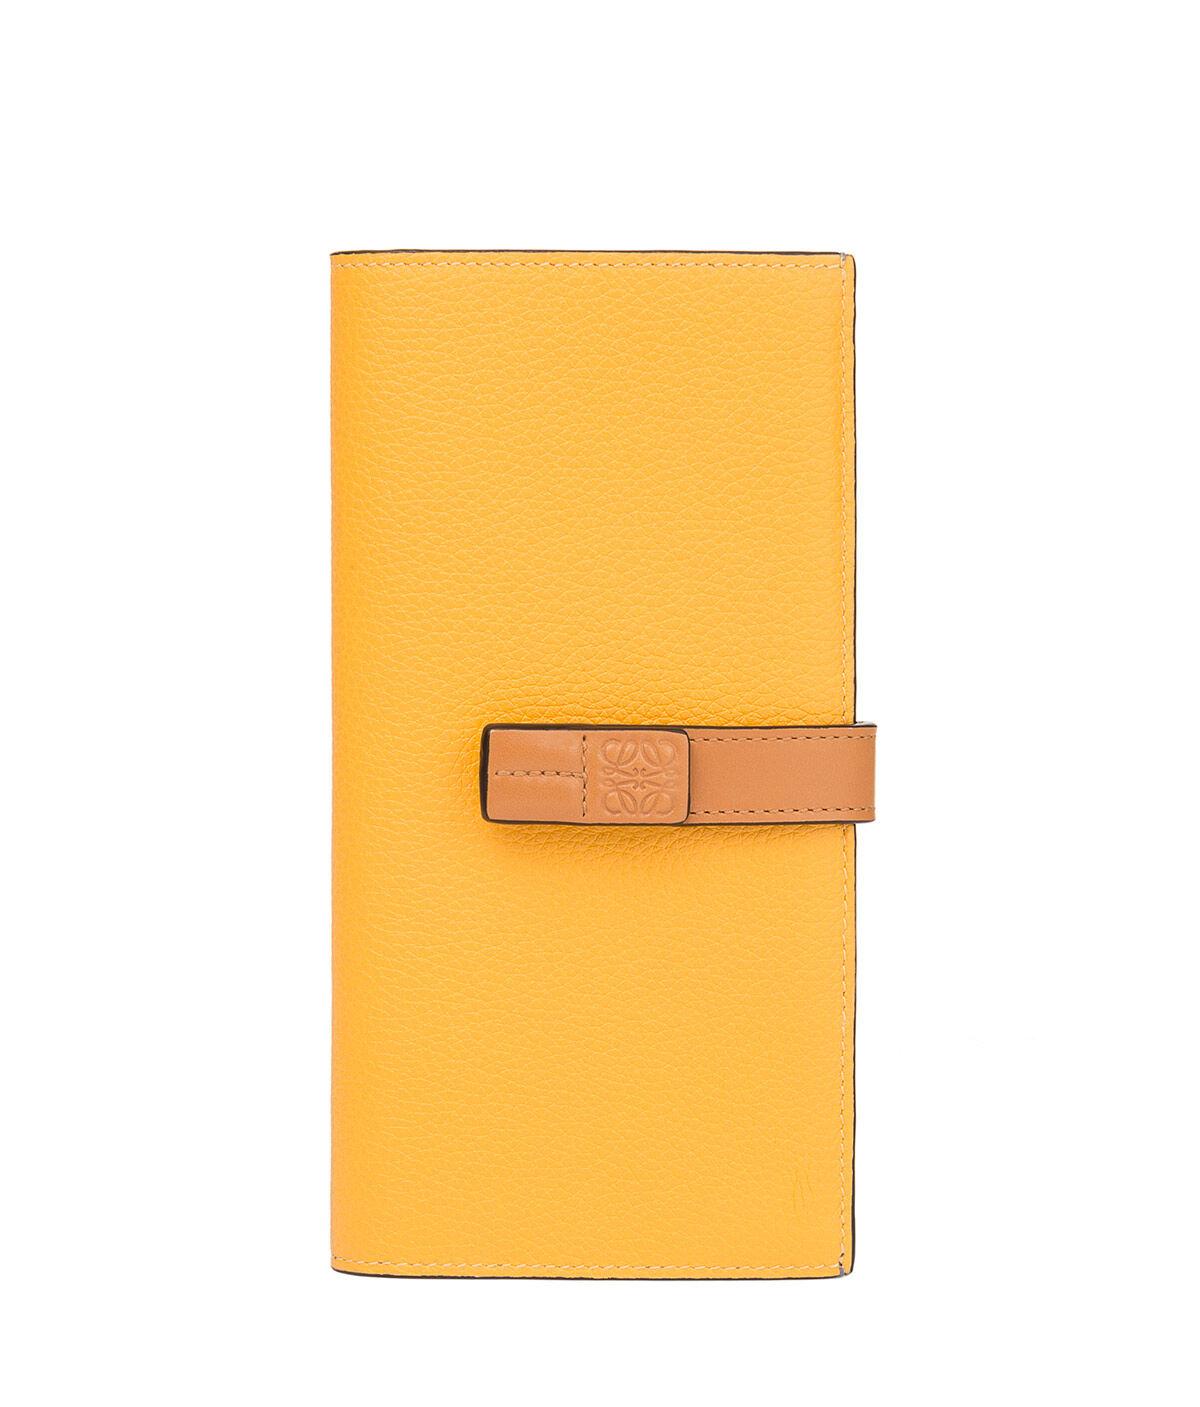 LOEWE Billetero Largo Vertical Amarillo Mango/Miel front